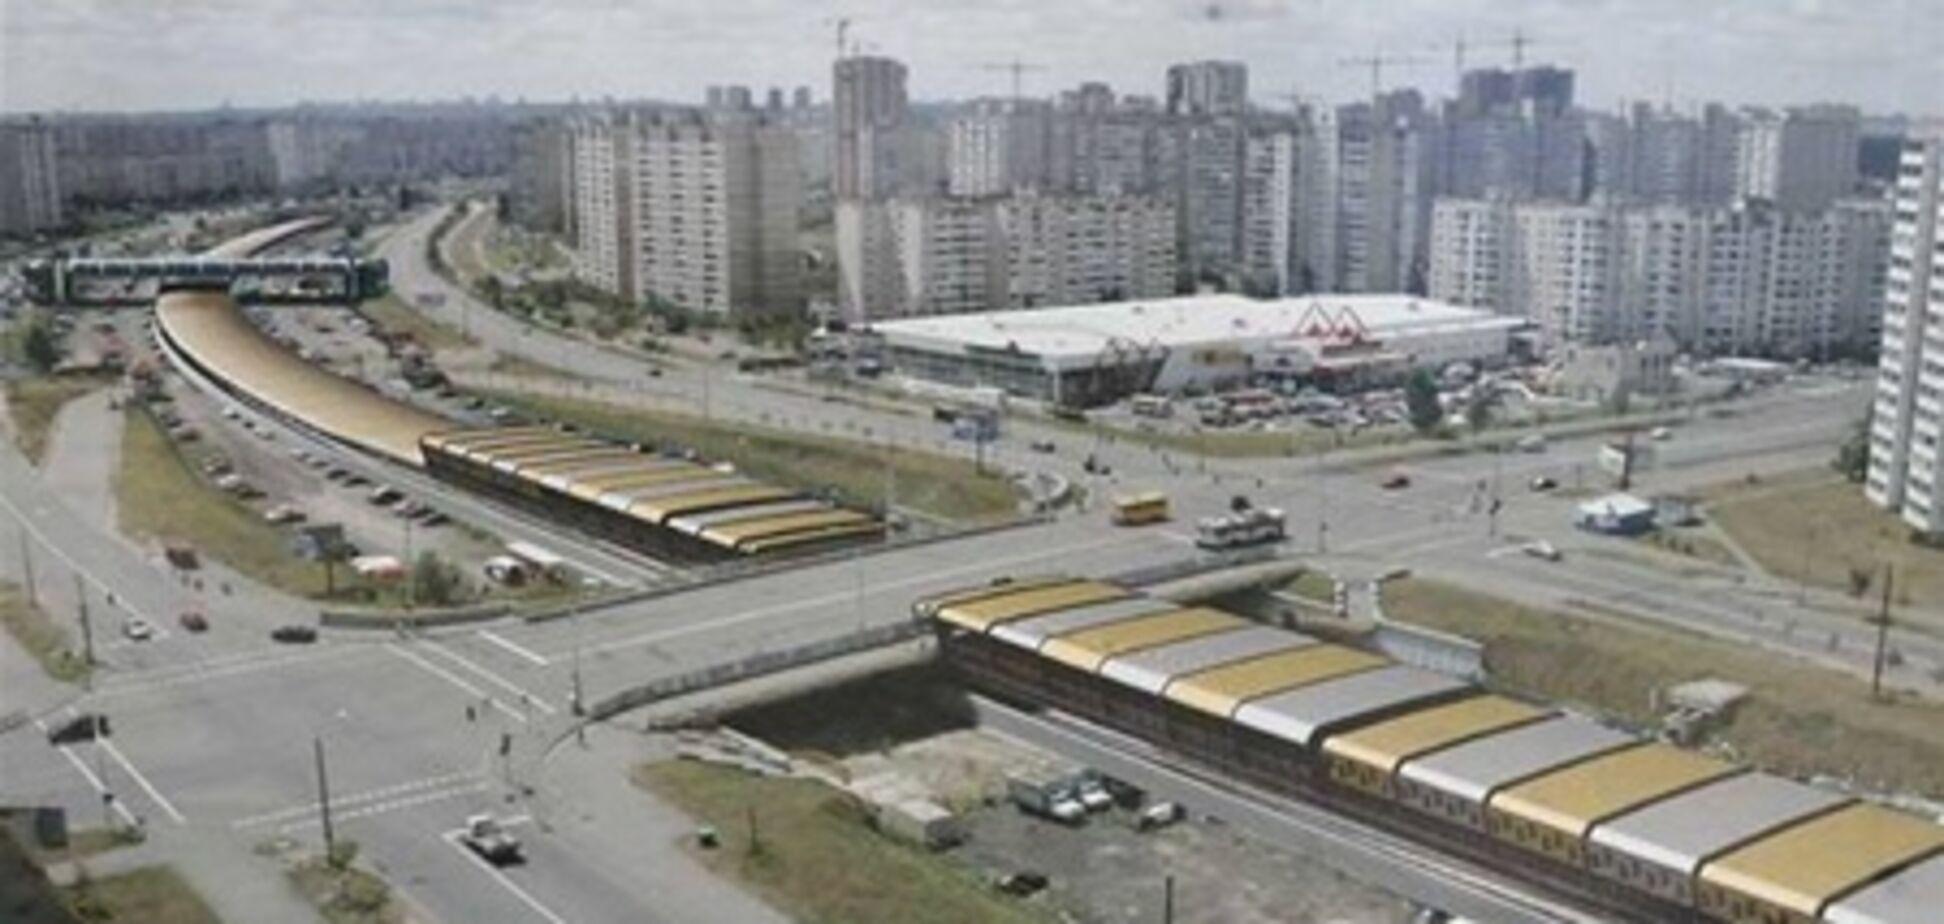 За четыре года построят 7 станций метро на Троещину